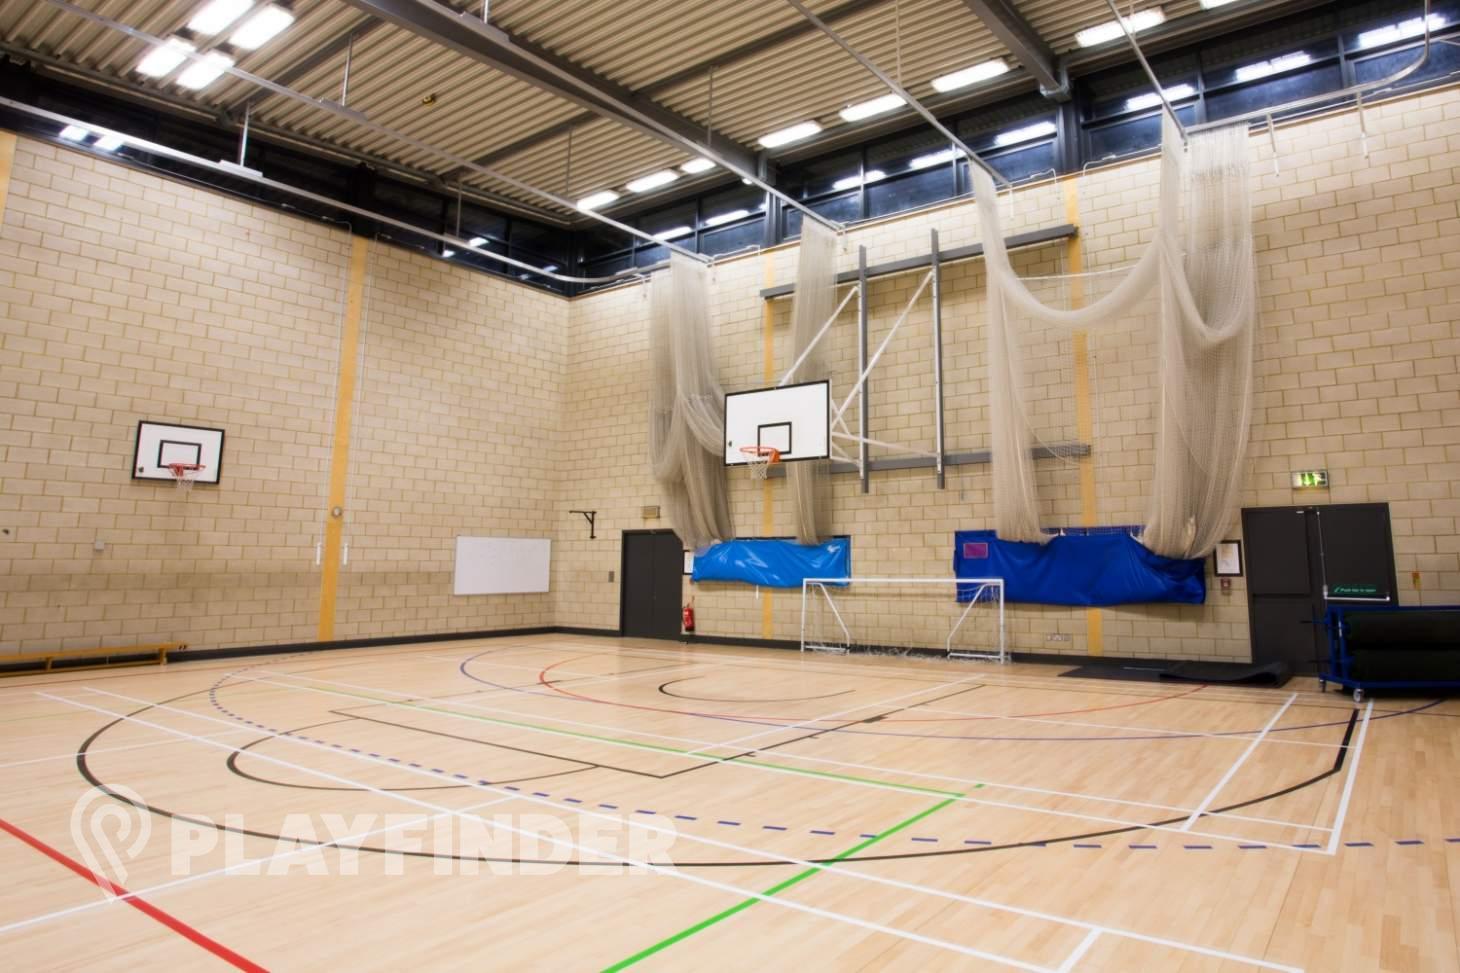 Brentside High School Nets | Artificial cricket facilities